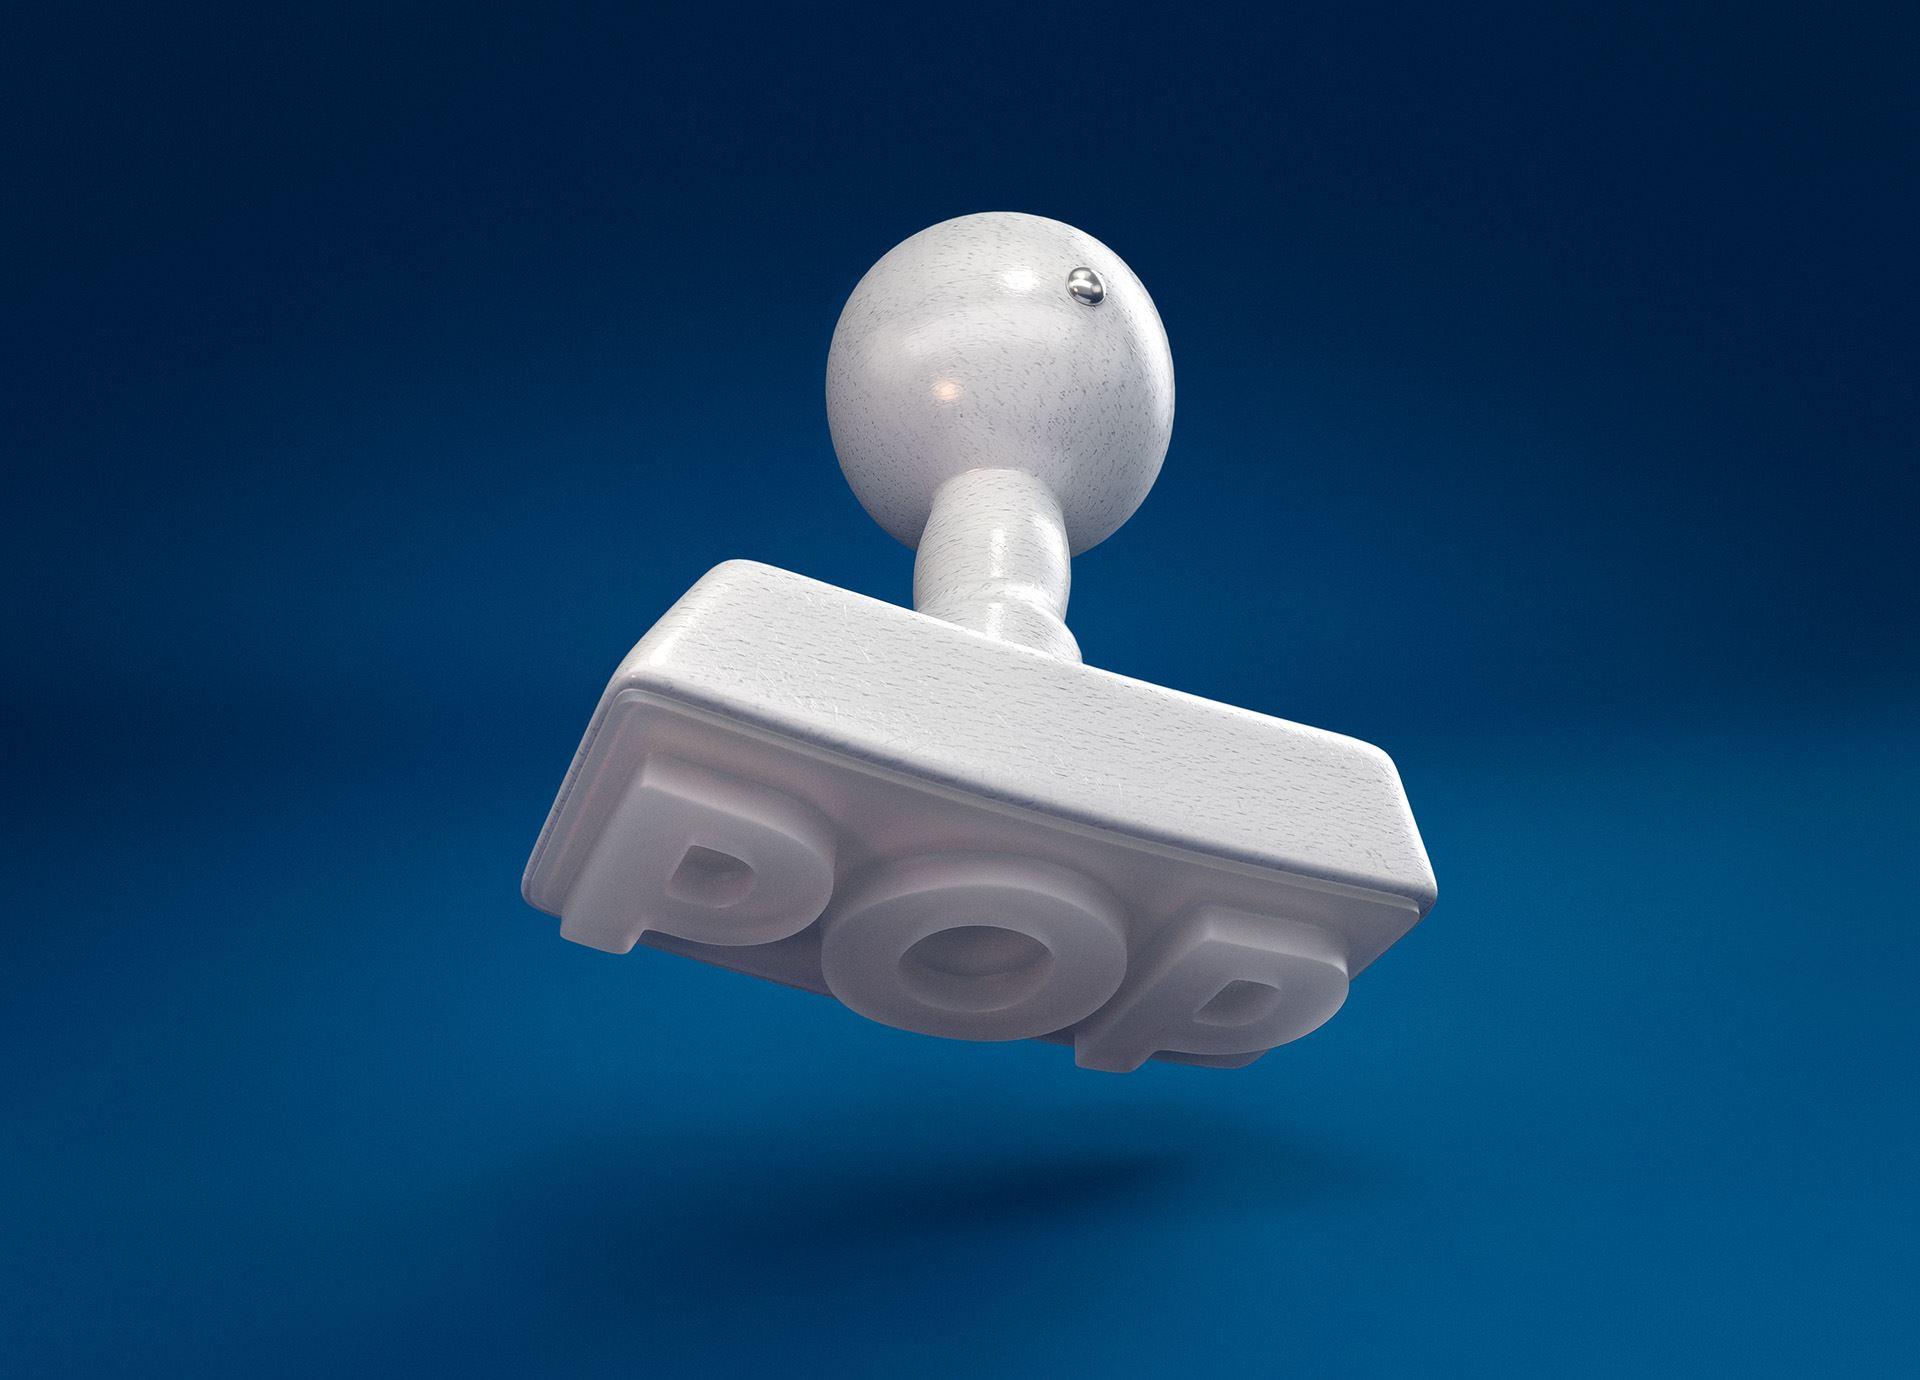 Clone Stamp Tool بالصور : تخيل شريط ادوات الفوتوشوب 3D